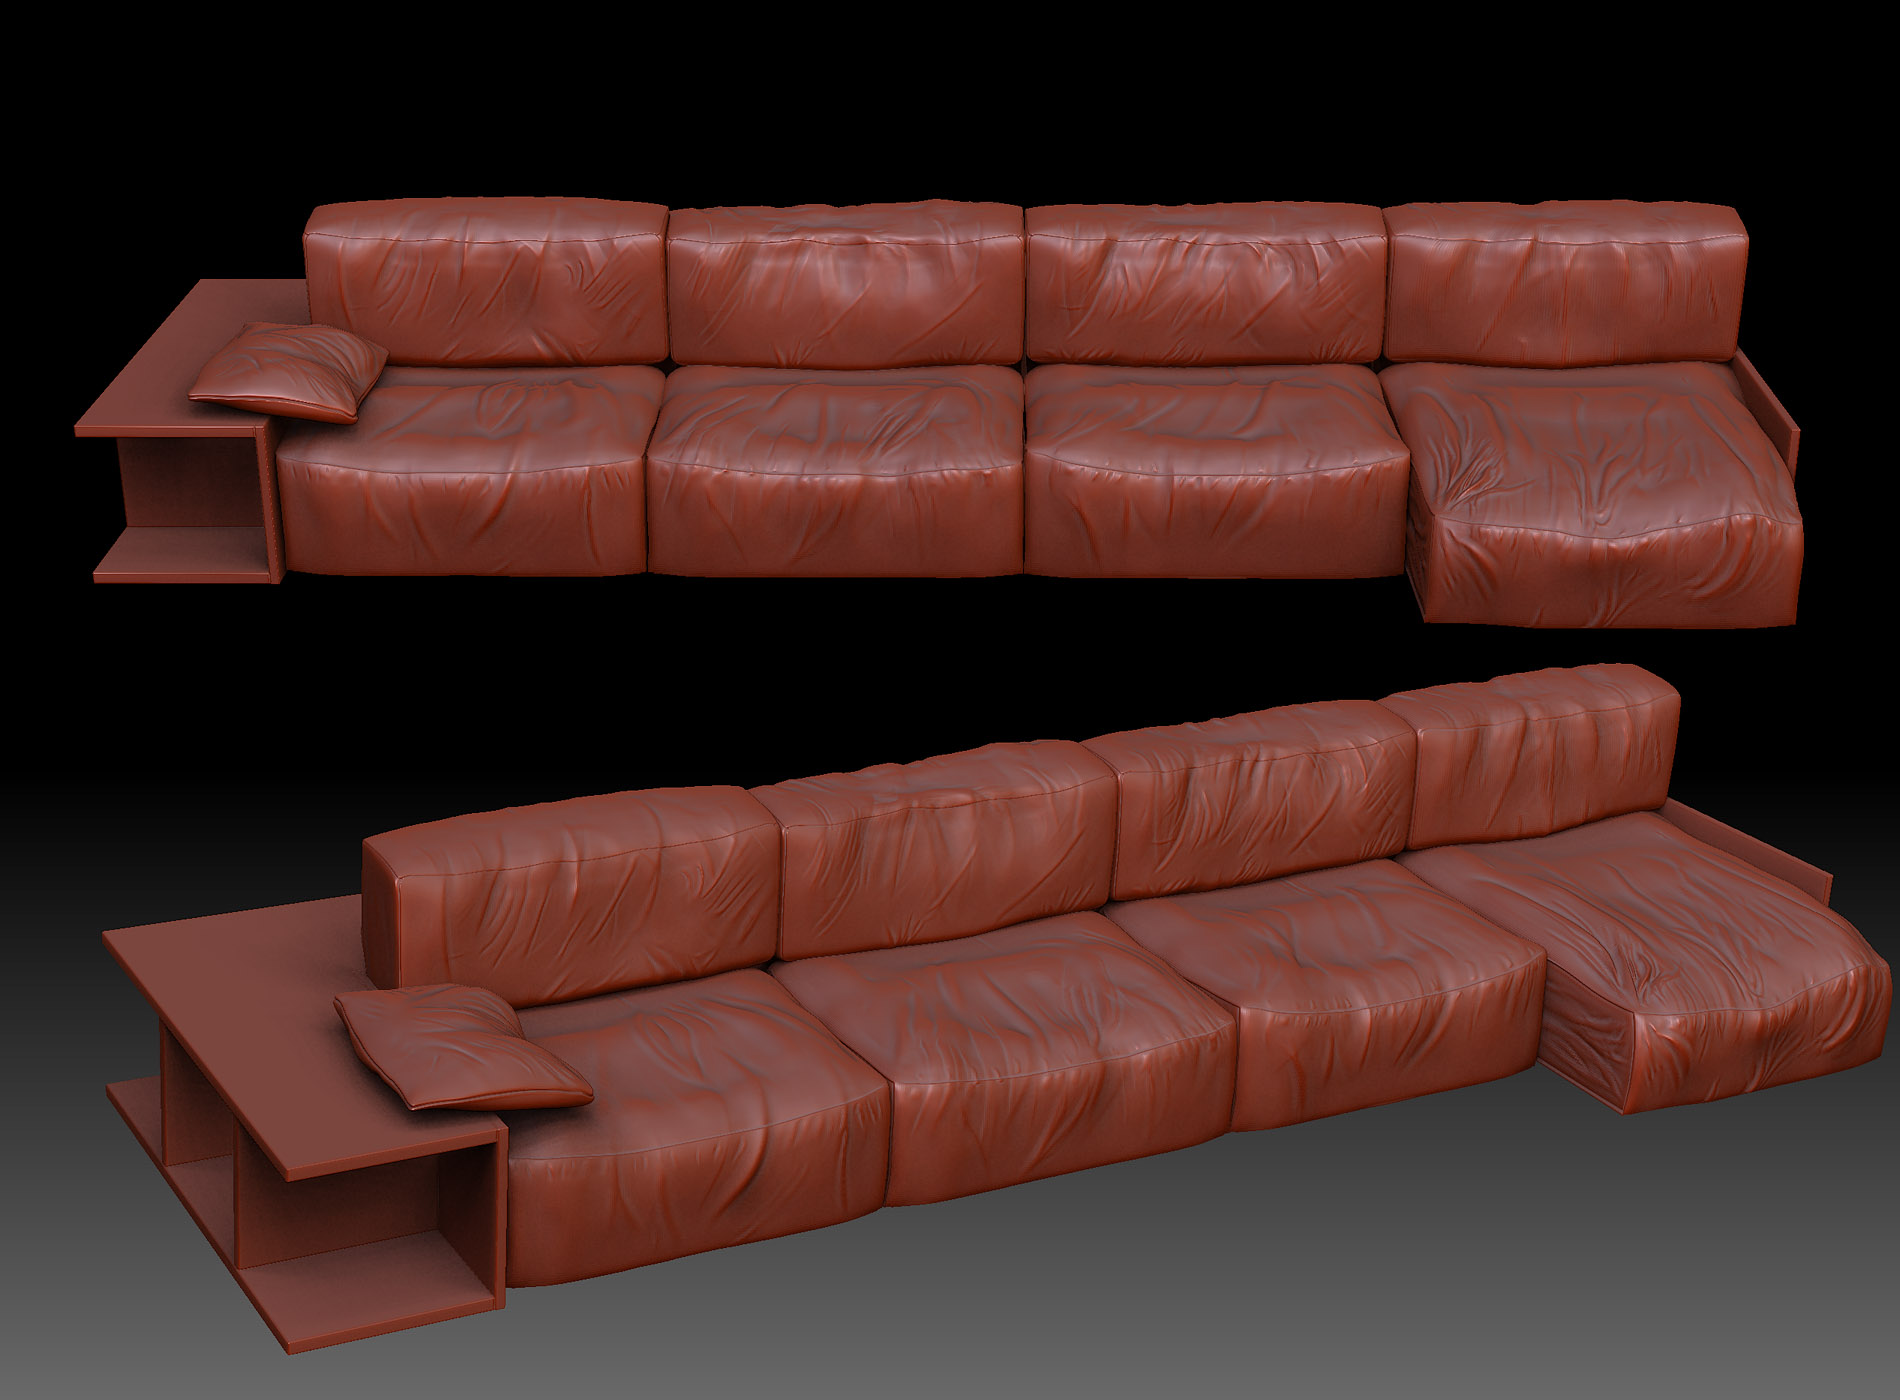 Sofa ZBrush by i-t-h-i-l on DeviantArt